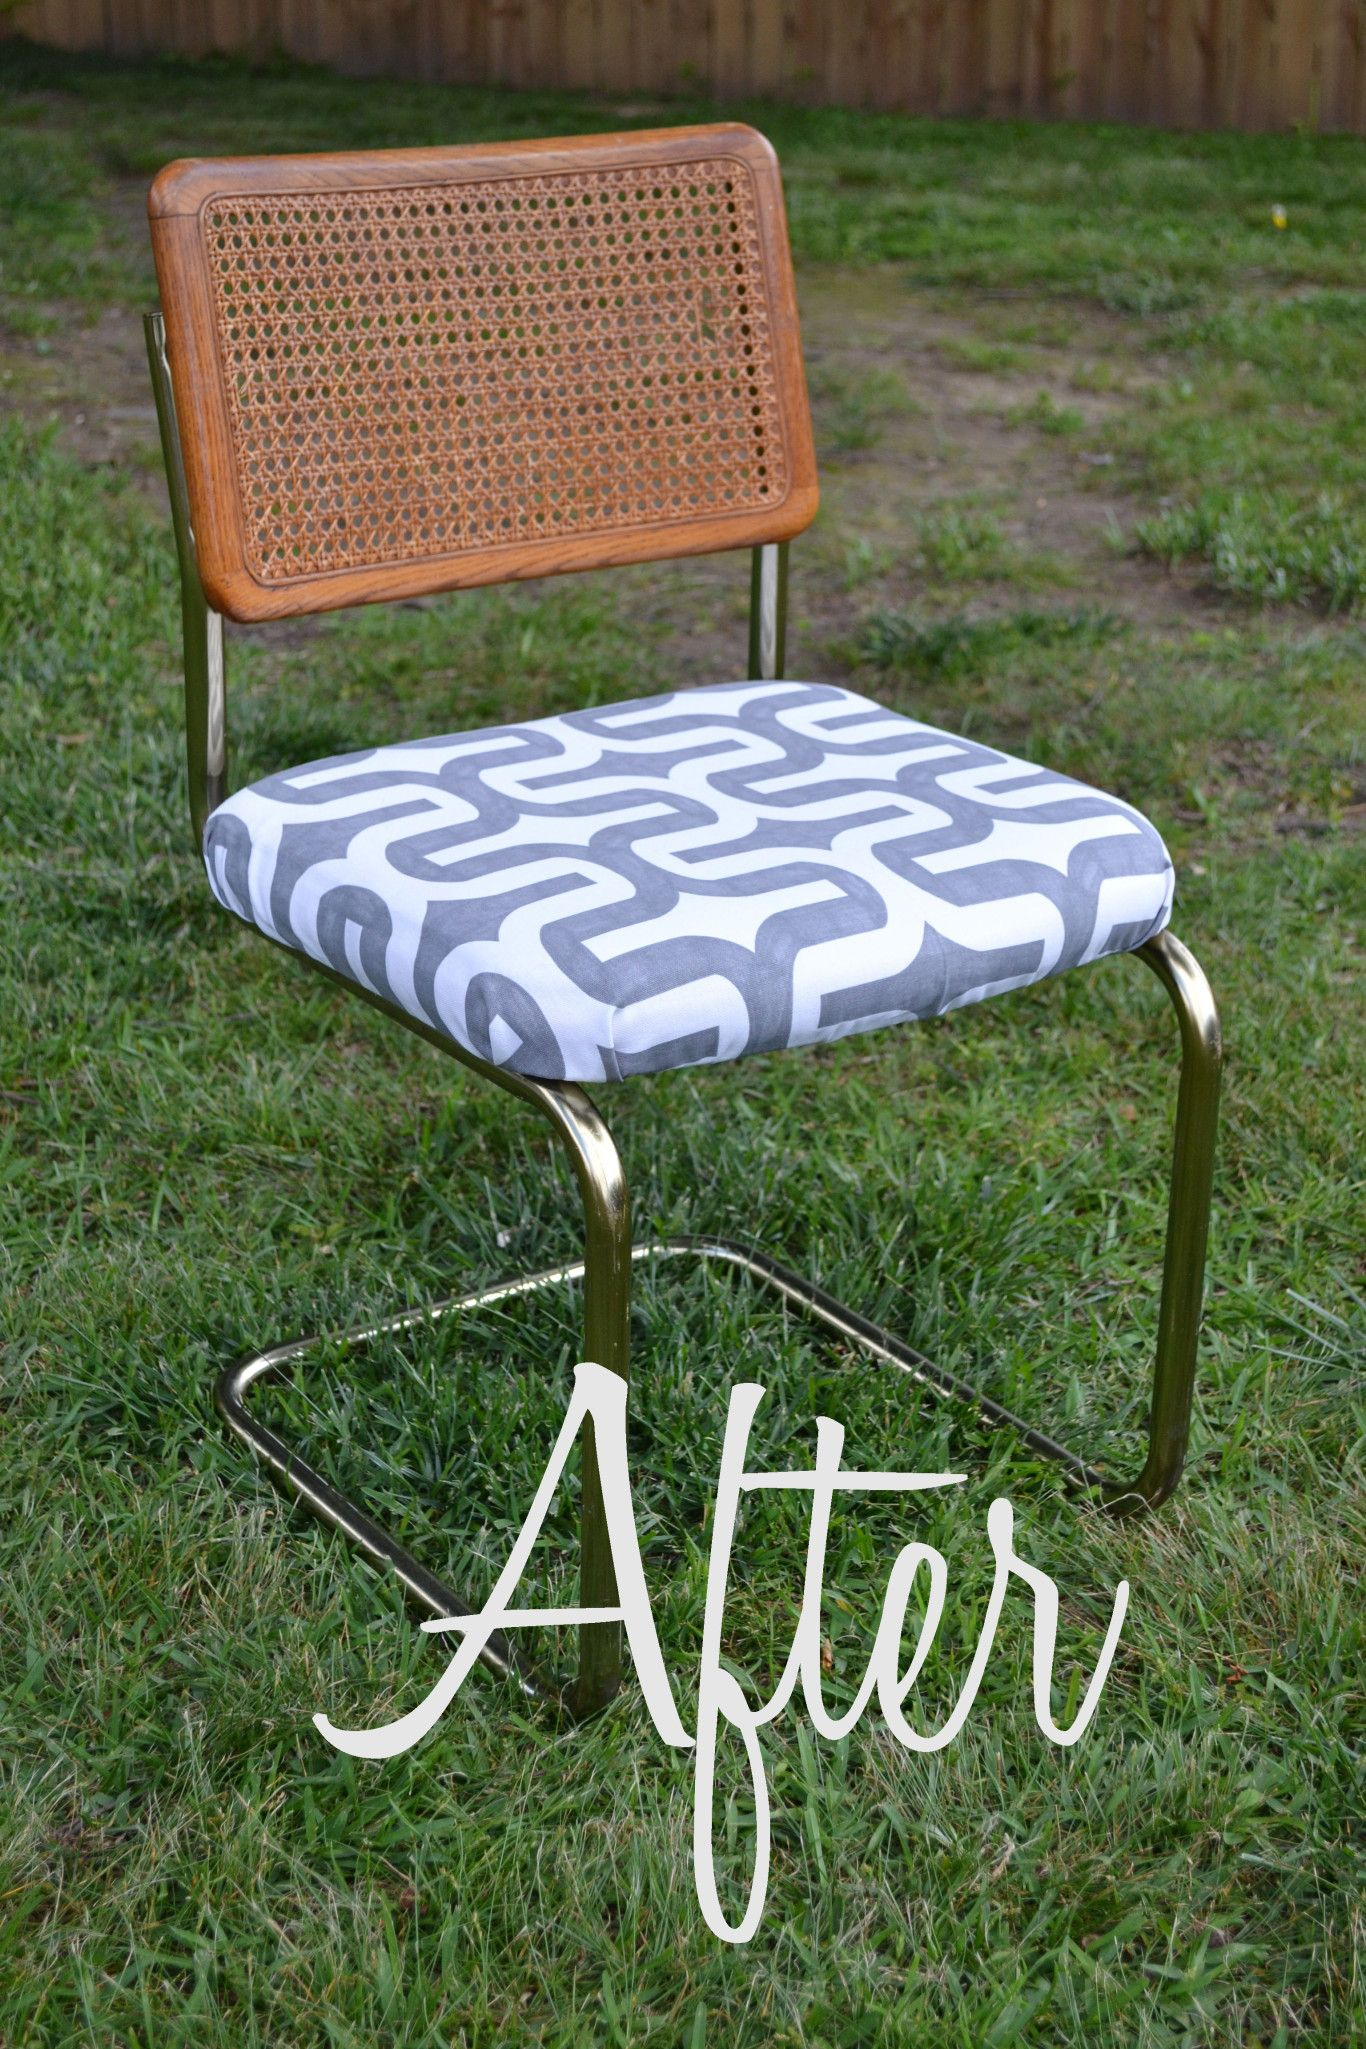 Chair Makeover Chair makeover, Cane chair makeover